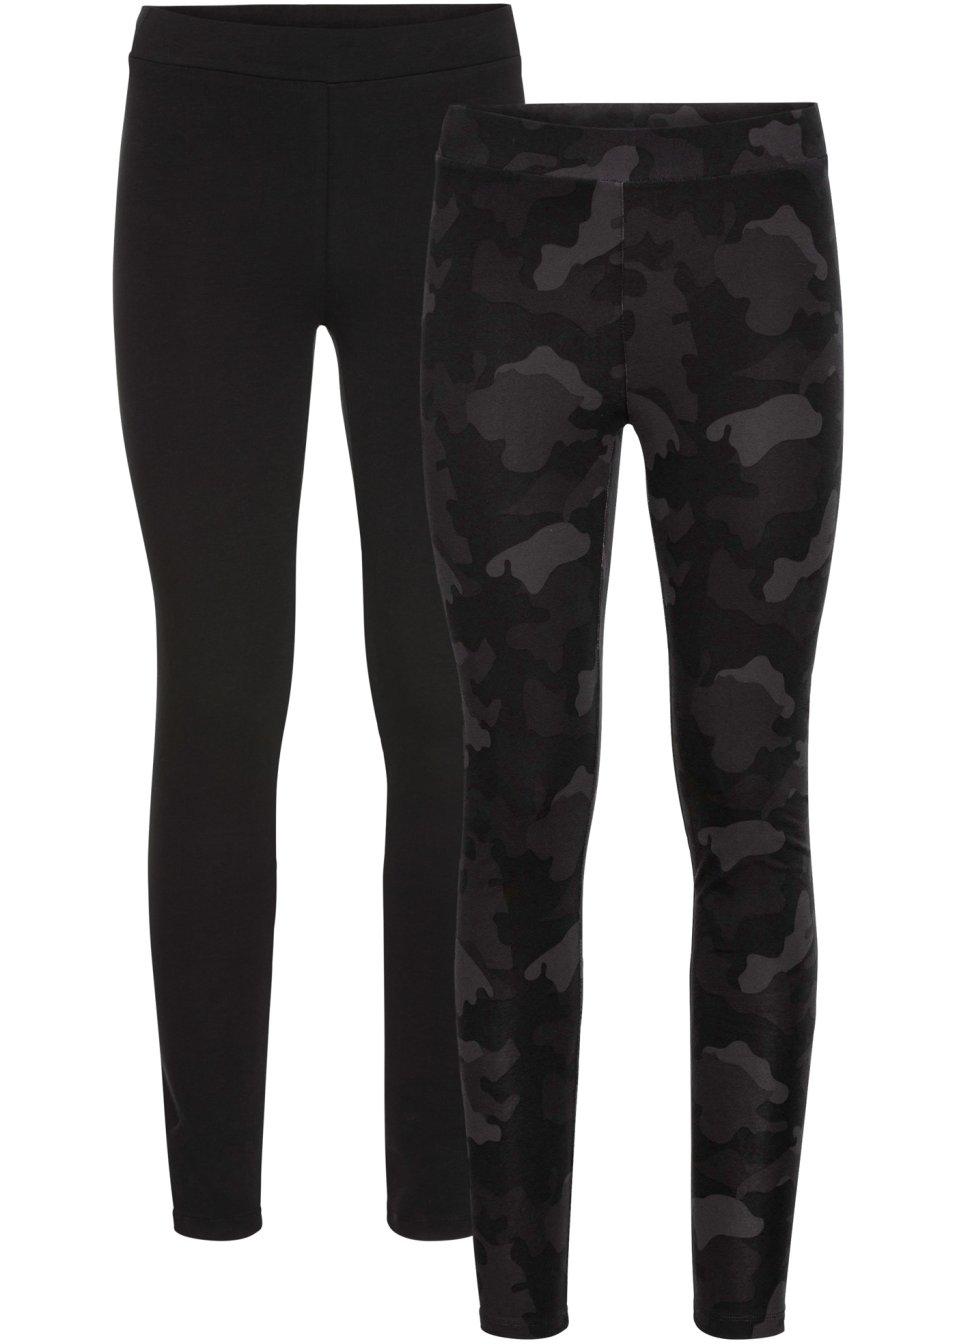 Vielseitig kombinierbare Leggings im Doppelpack - schwarz camouflage rBQnM KOzaG